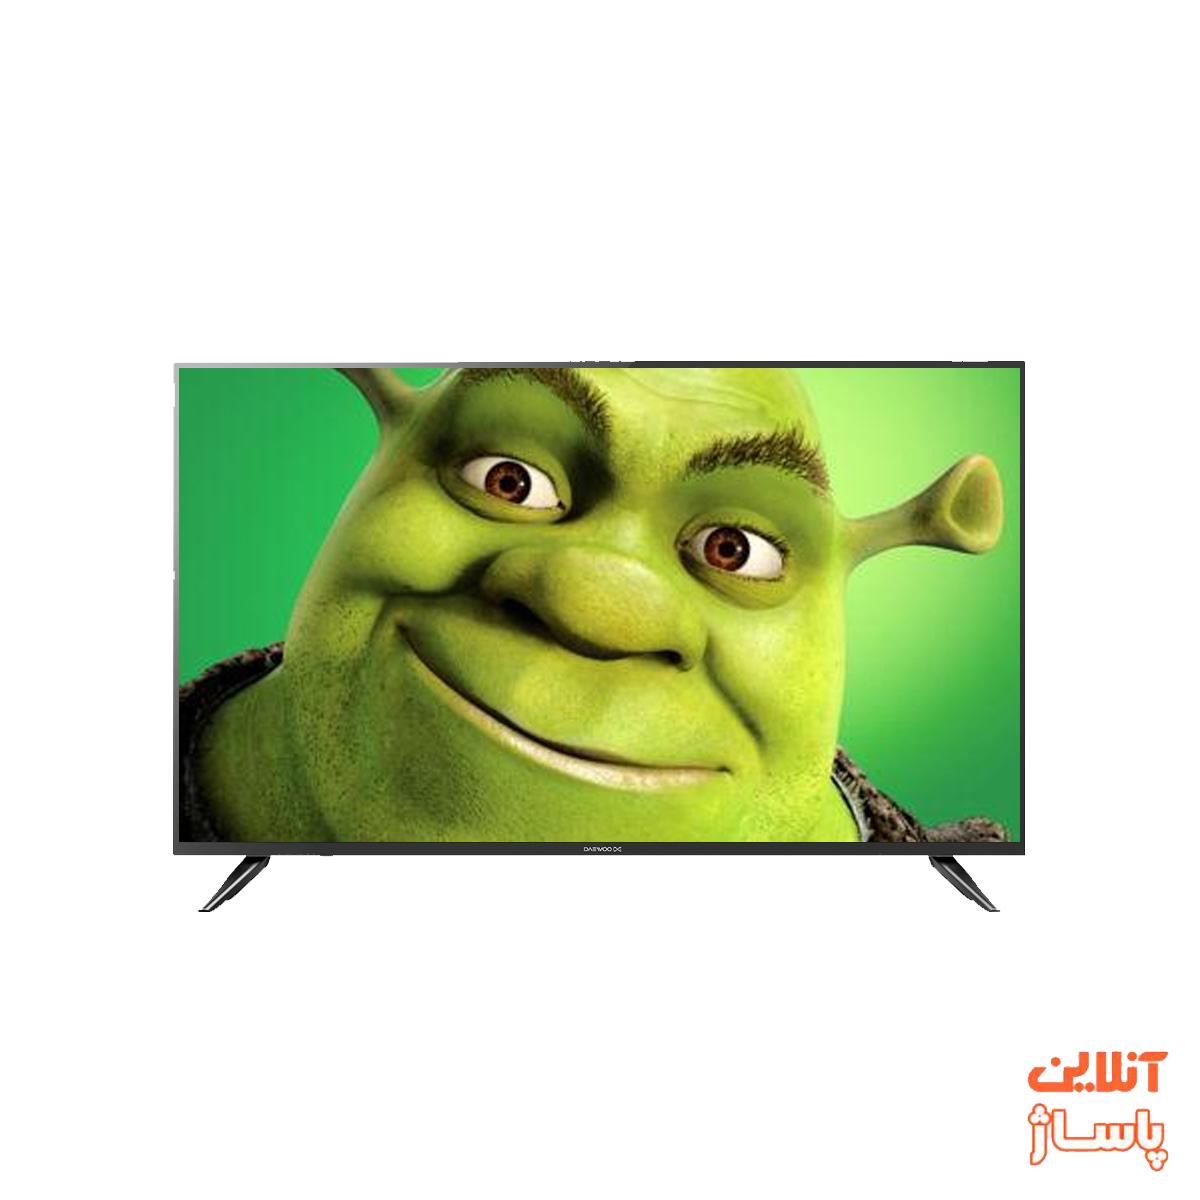 تلویزیون ال ای دی دوو مدل DLE-H1800U سایز 55 اینچ